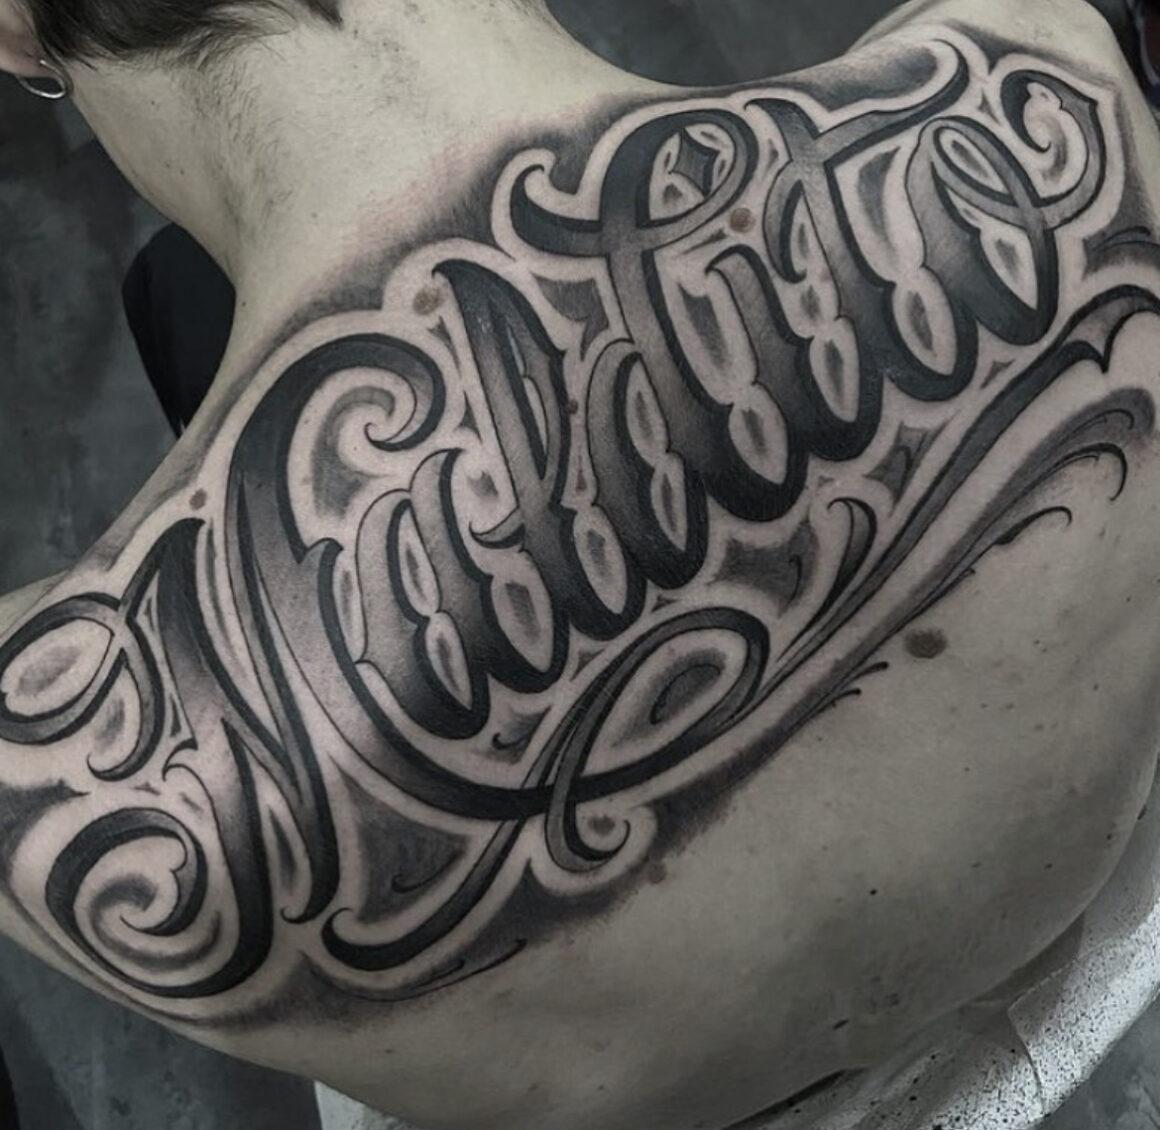 Brigante, Remember Me Tattoo, Bollate, Italy